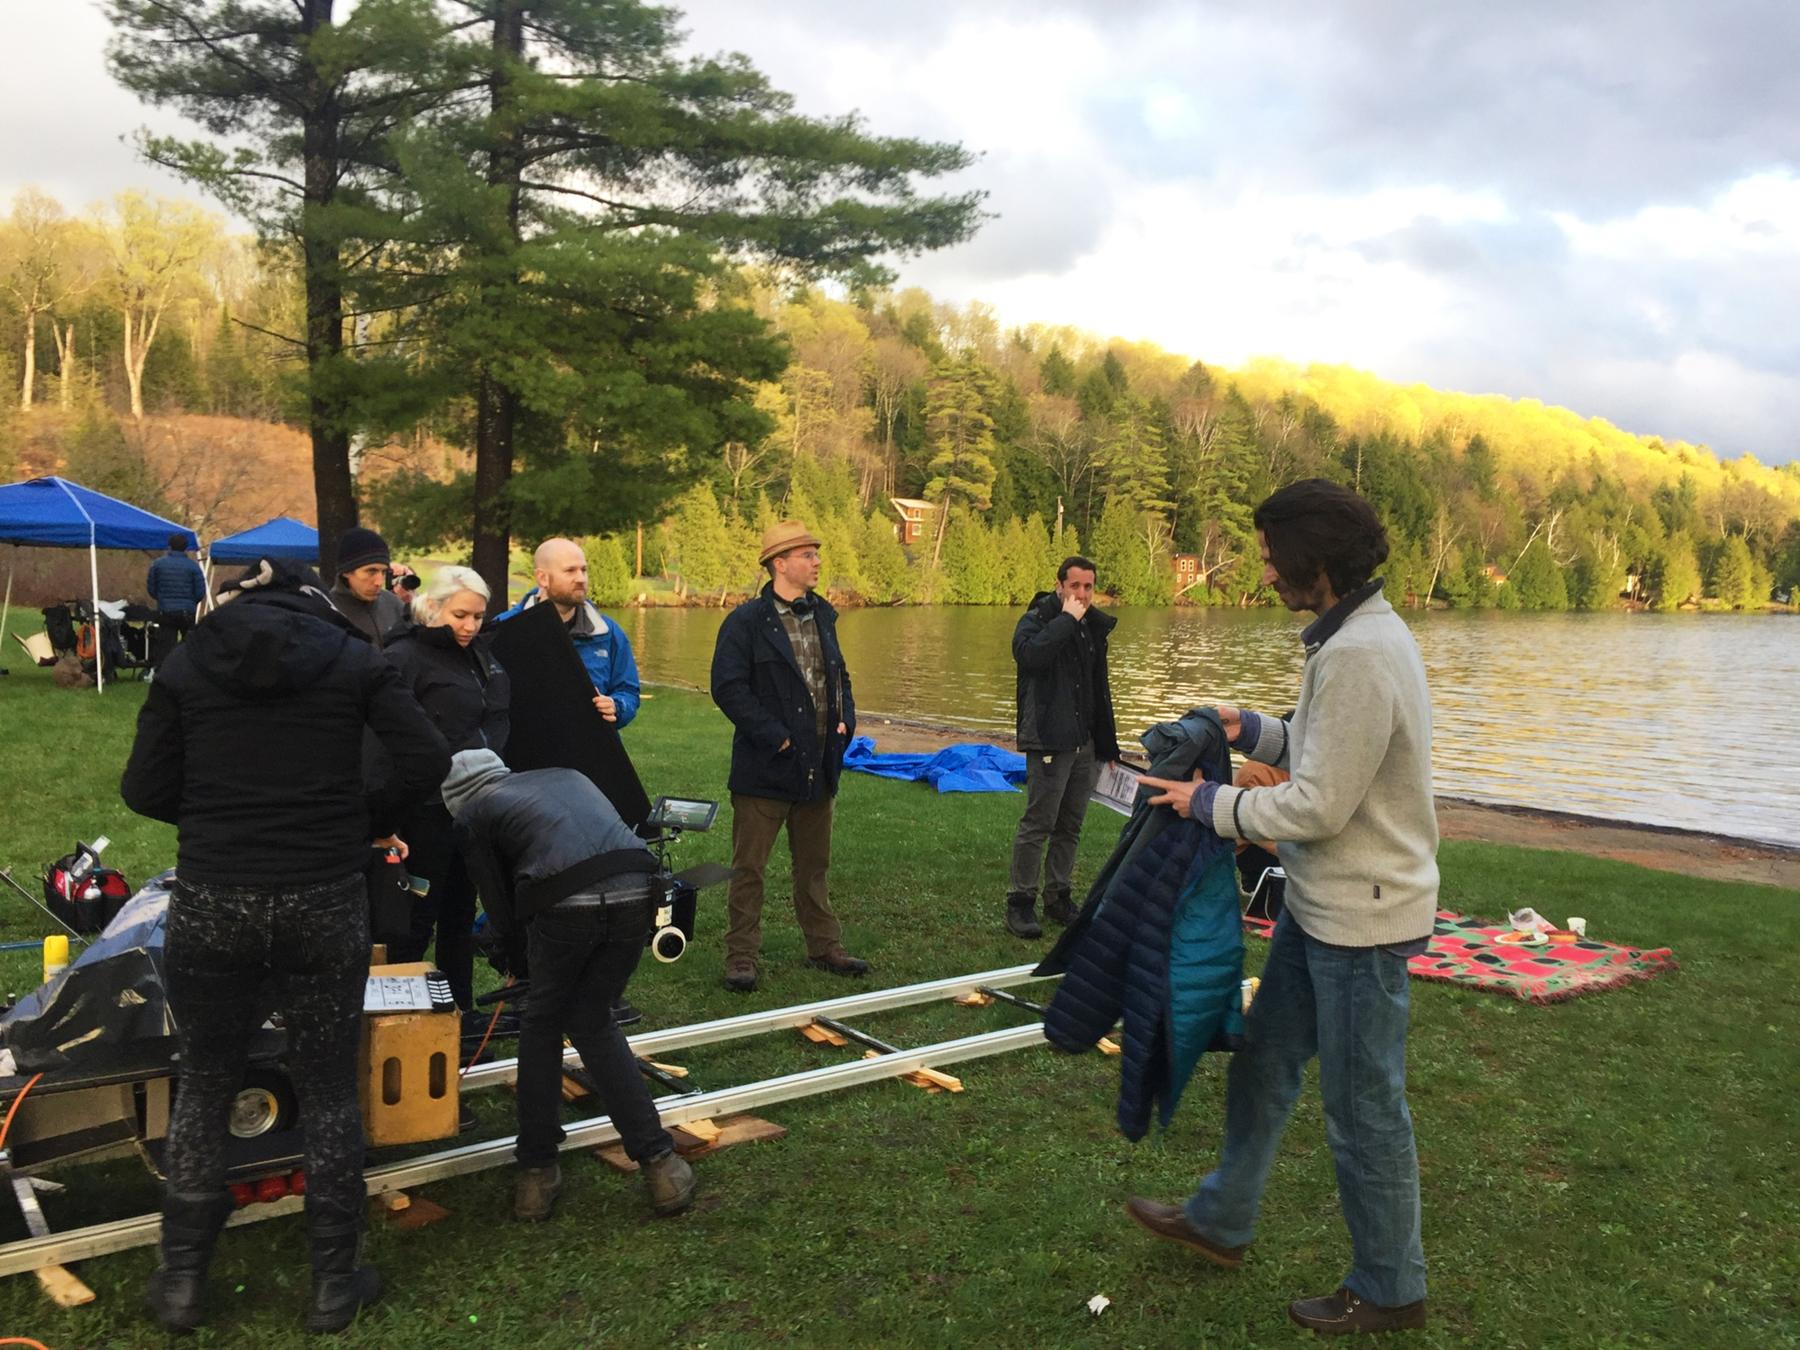 the-luring-set-photo-lake-scene.jpg